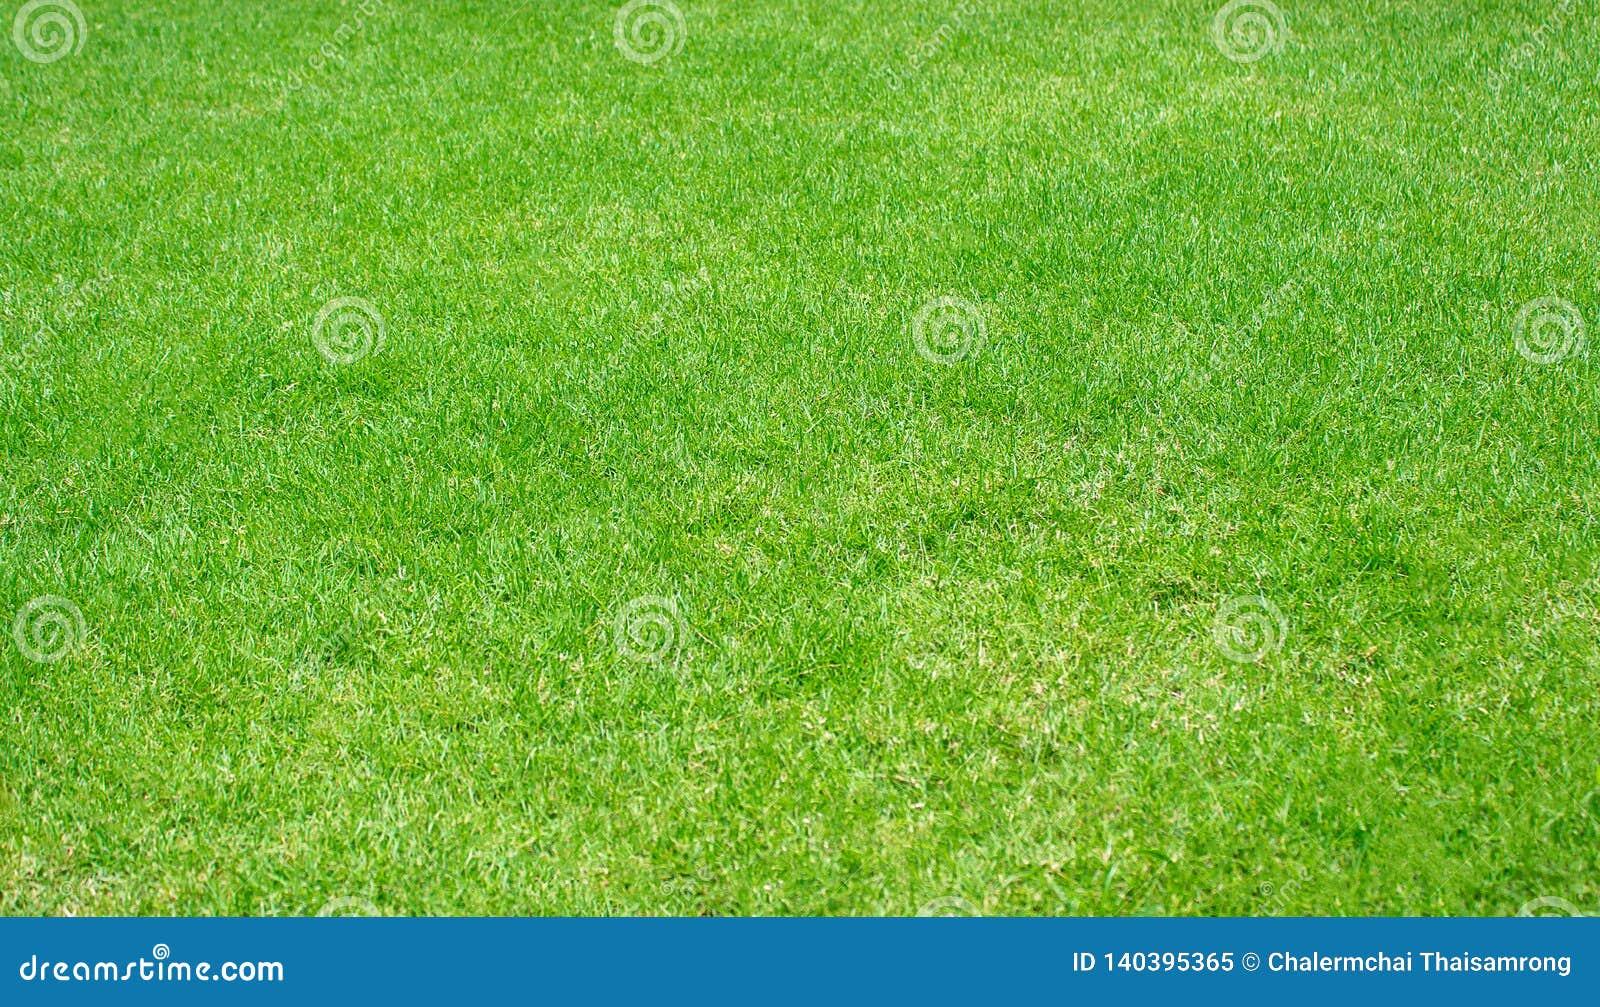 Green Lawn Pattern Textured Background Fresh Green Manicured